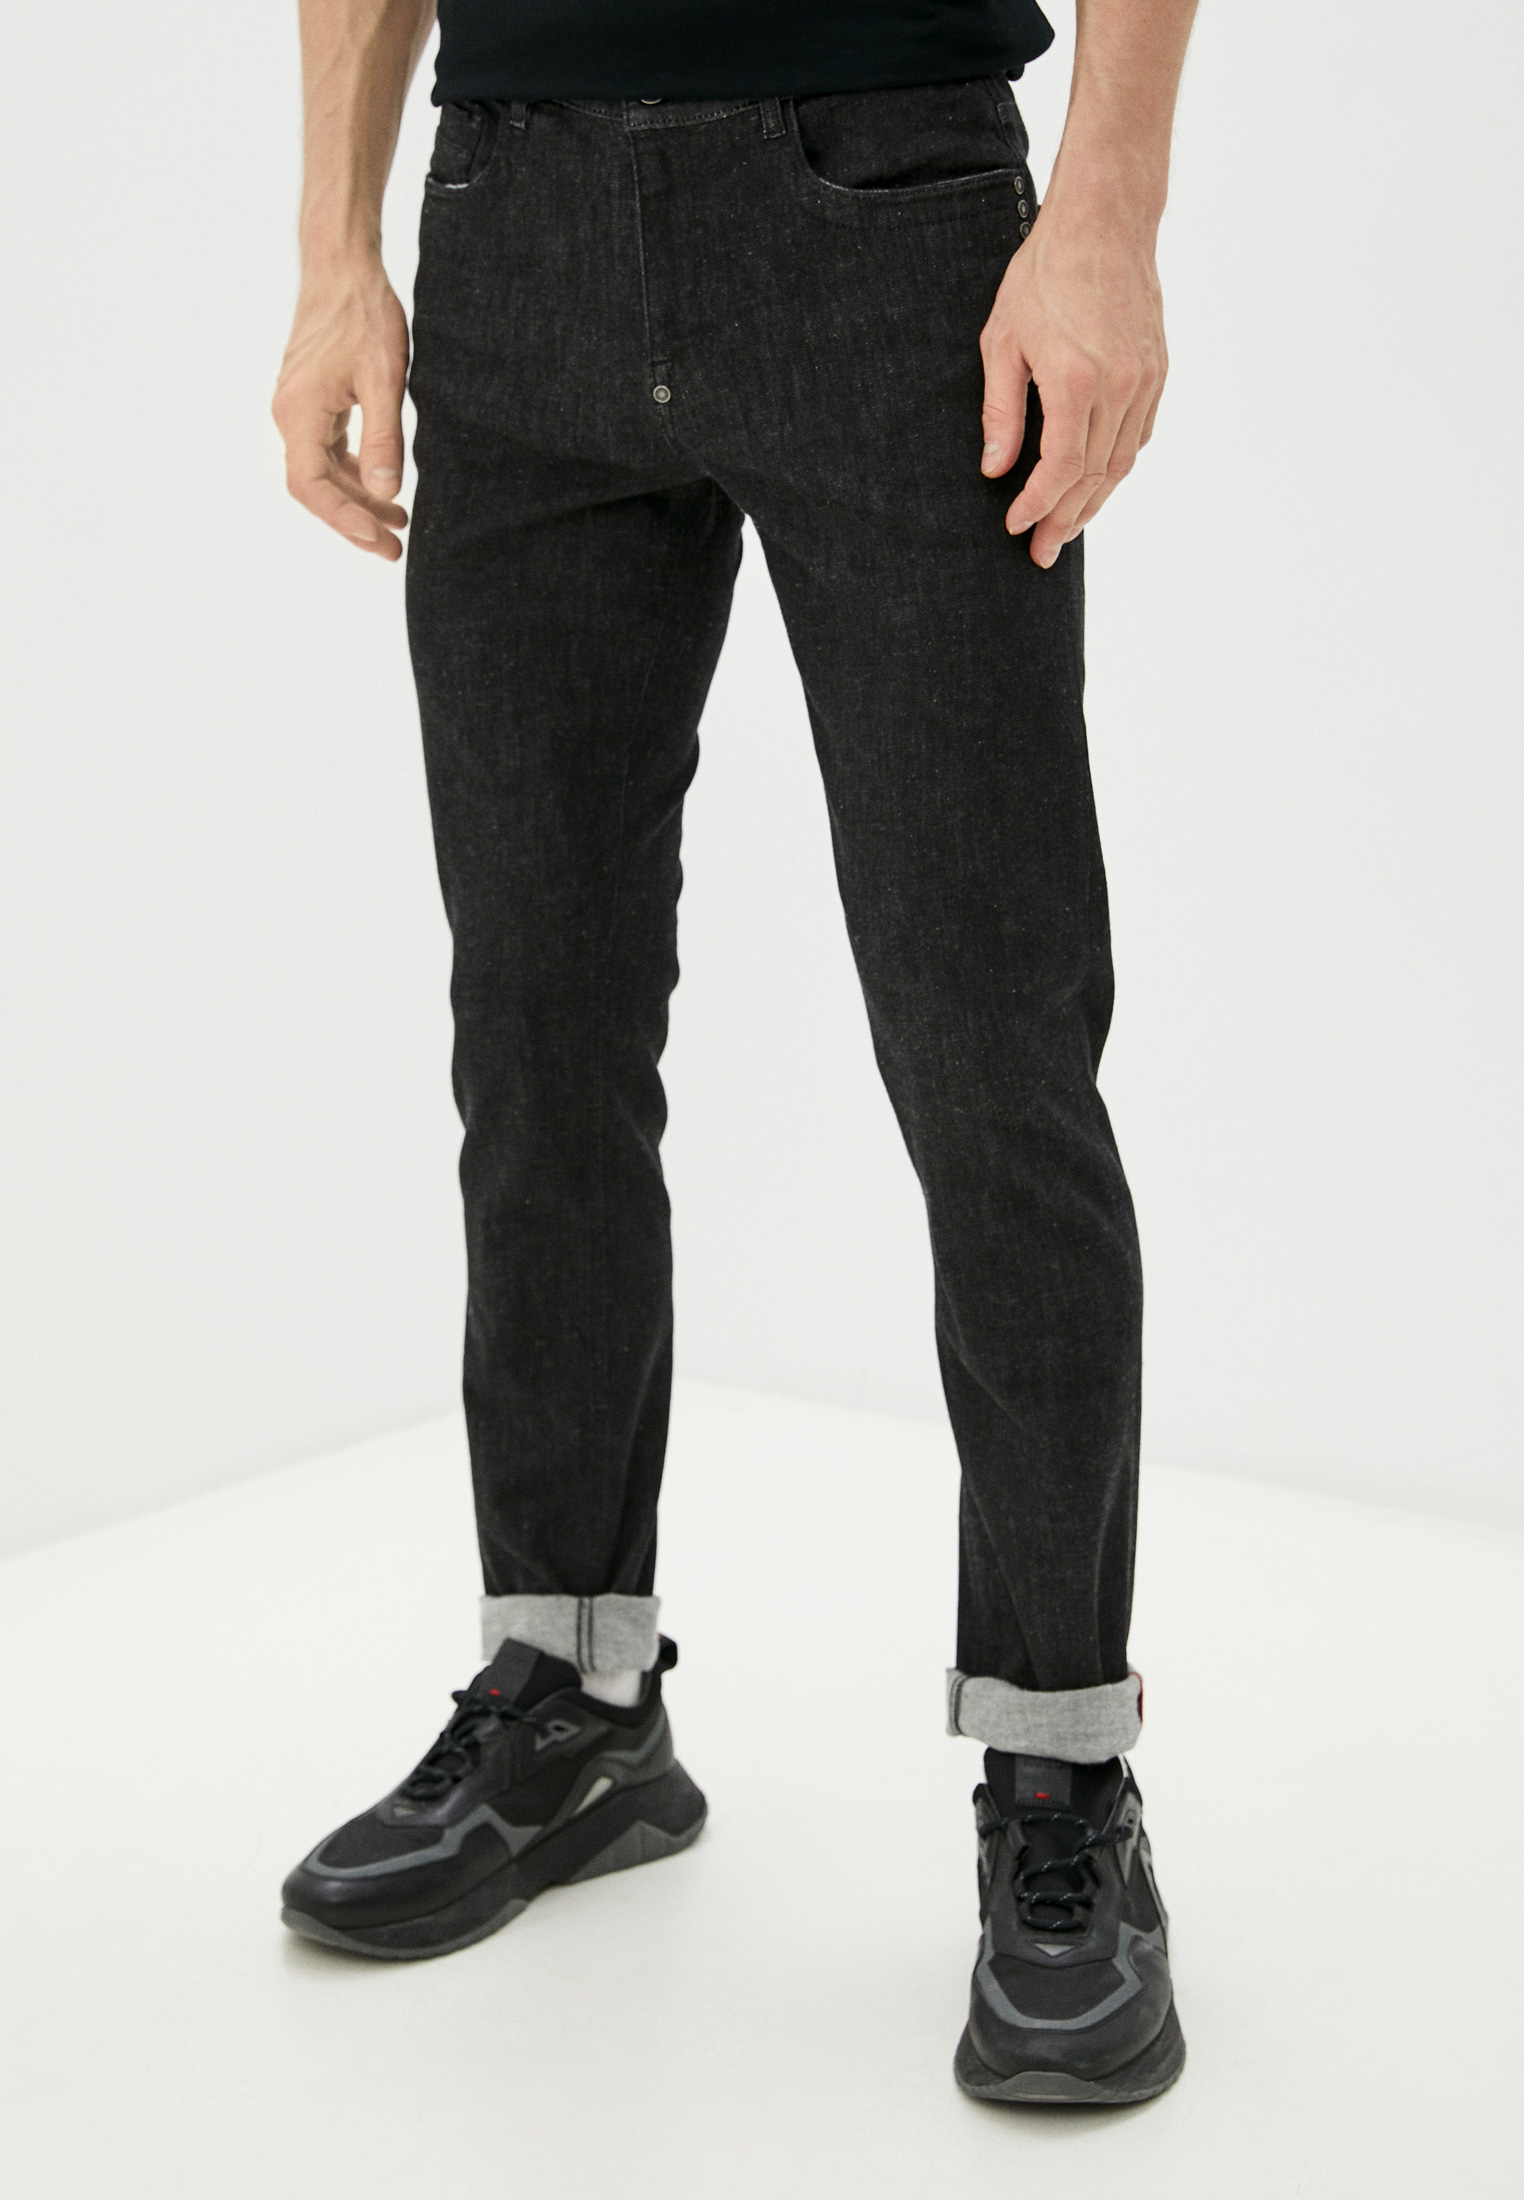 Мужские зауженные джинсы Bikkembergs (Биккембергс) C Q 111 02 S 3446